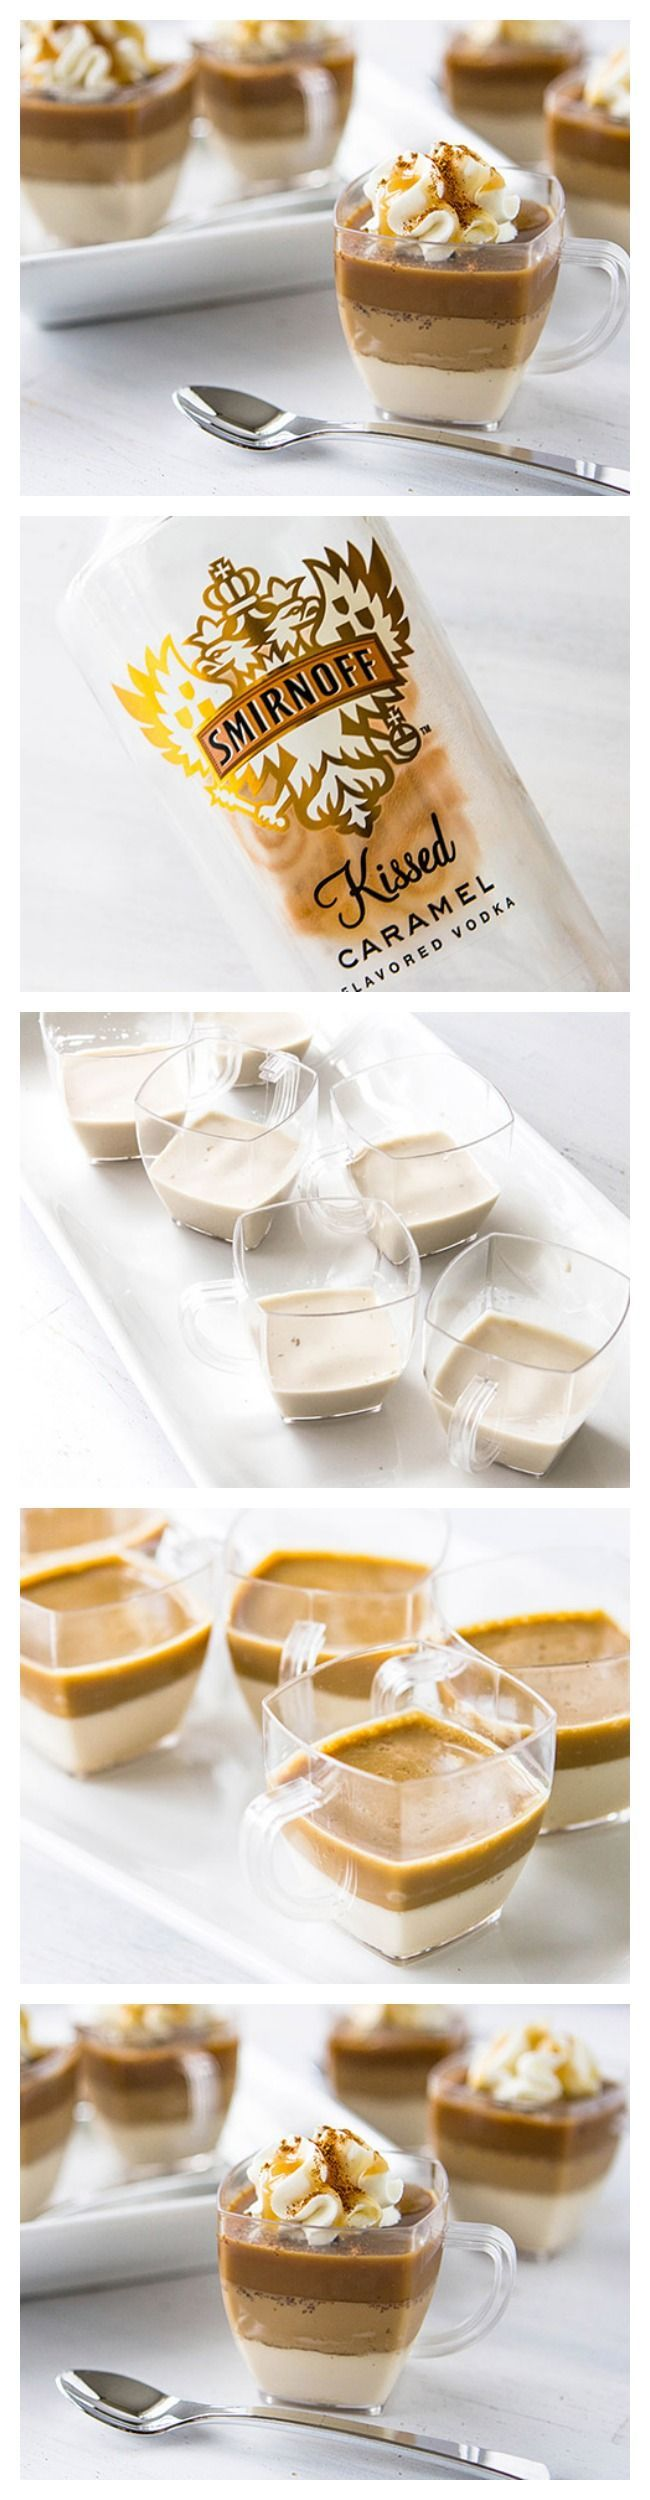 Caramel Macchiato Jelly Shots. Recipes -> http://www.ilgilibilgili.com/en/category/food-drink